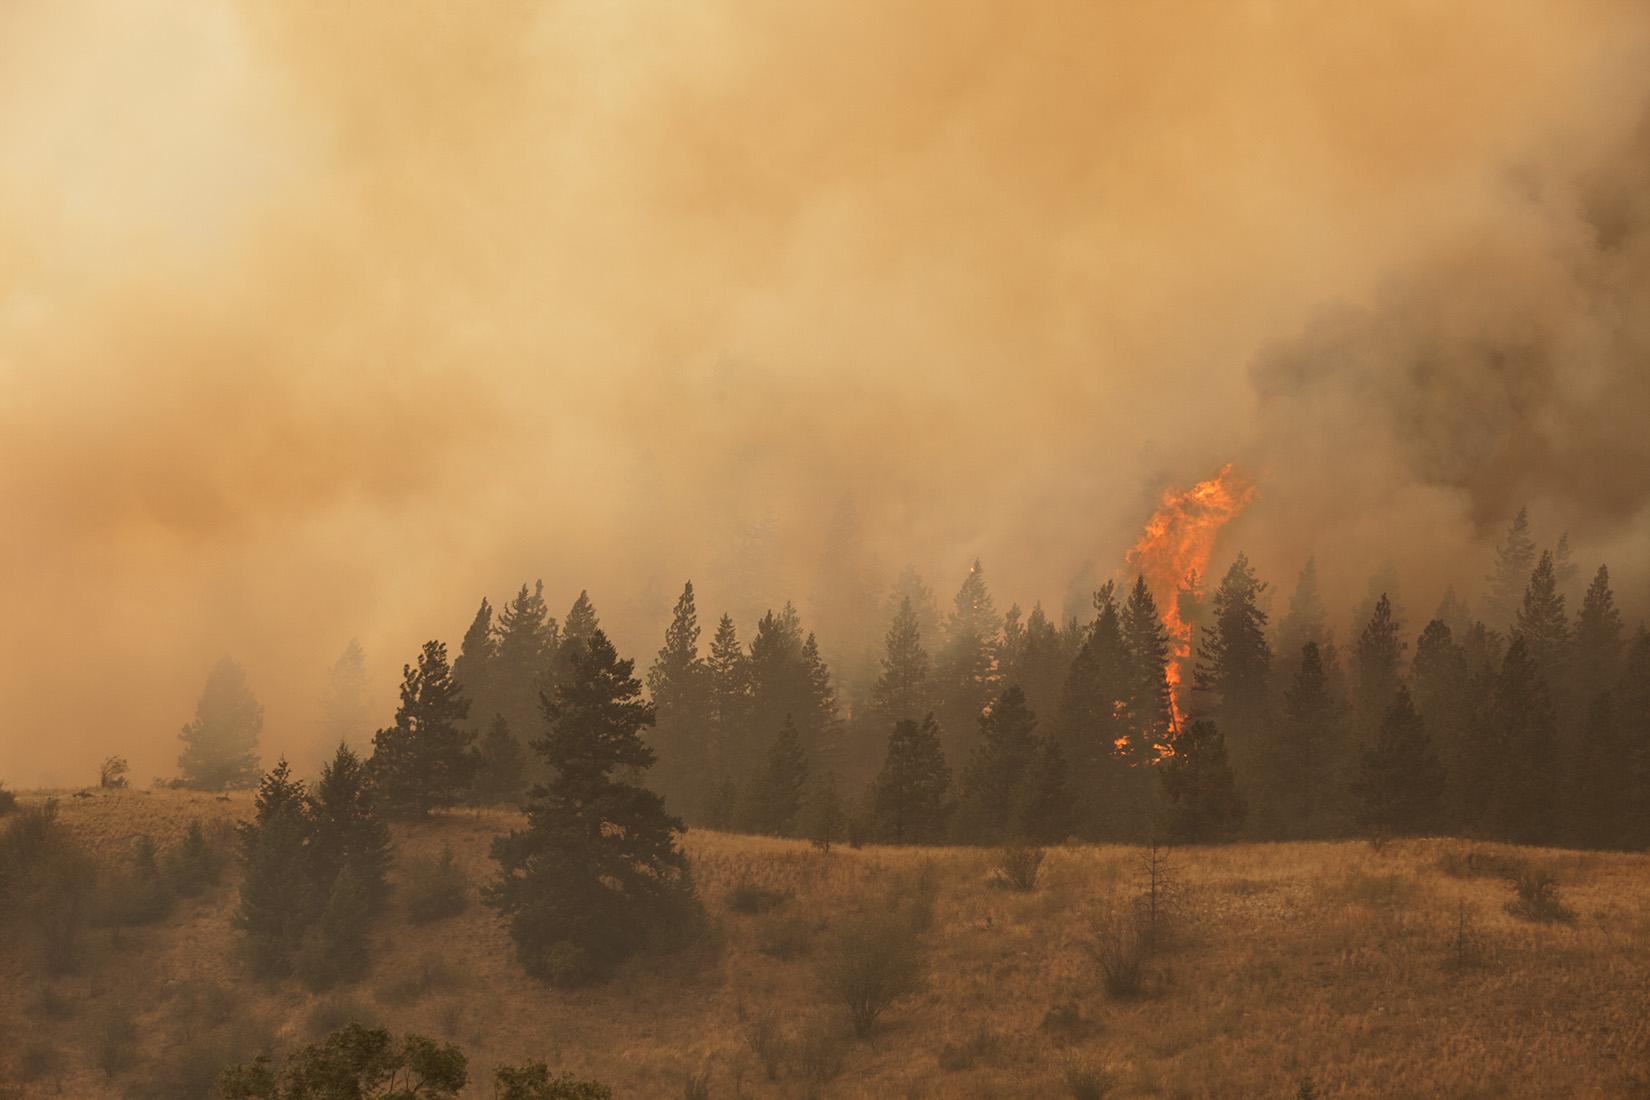 Sinlahekin Wildlife Area near Blue Lake during 2015 Okanogan Complex Fire. Photo © John Marshall.